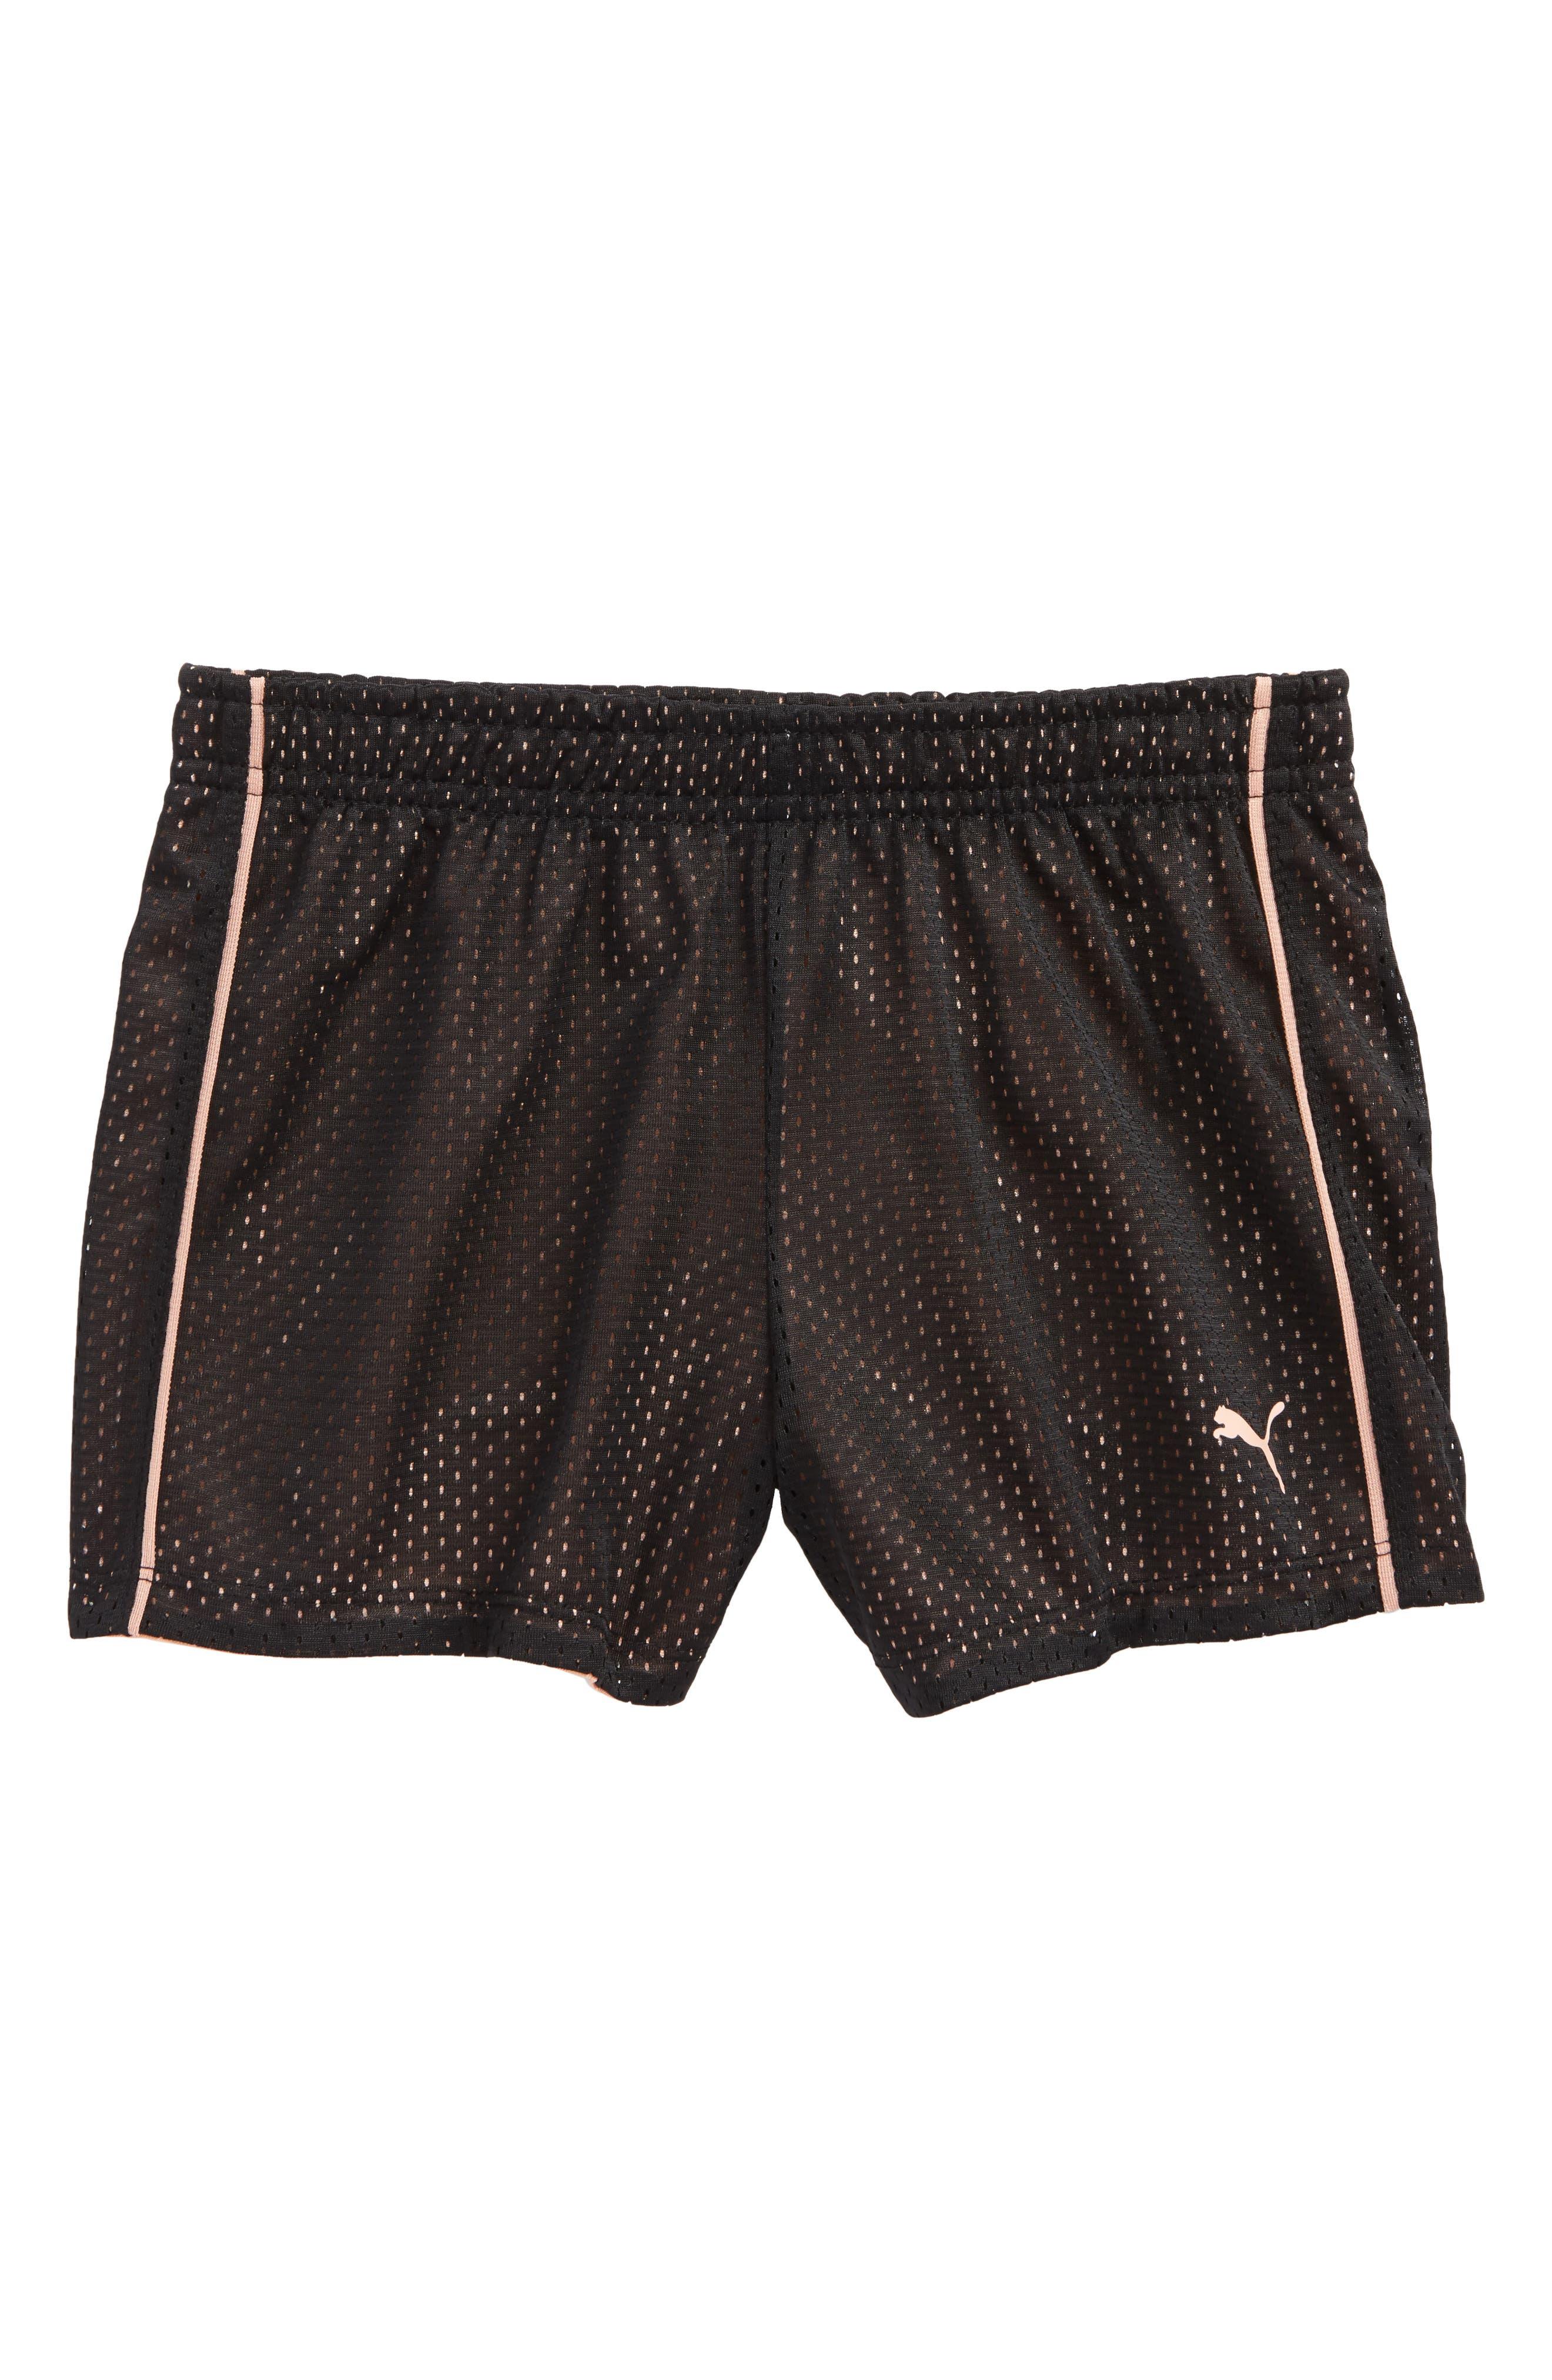 Mesh Shorts,                         Main,                         color, Puma Black